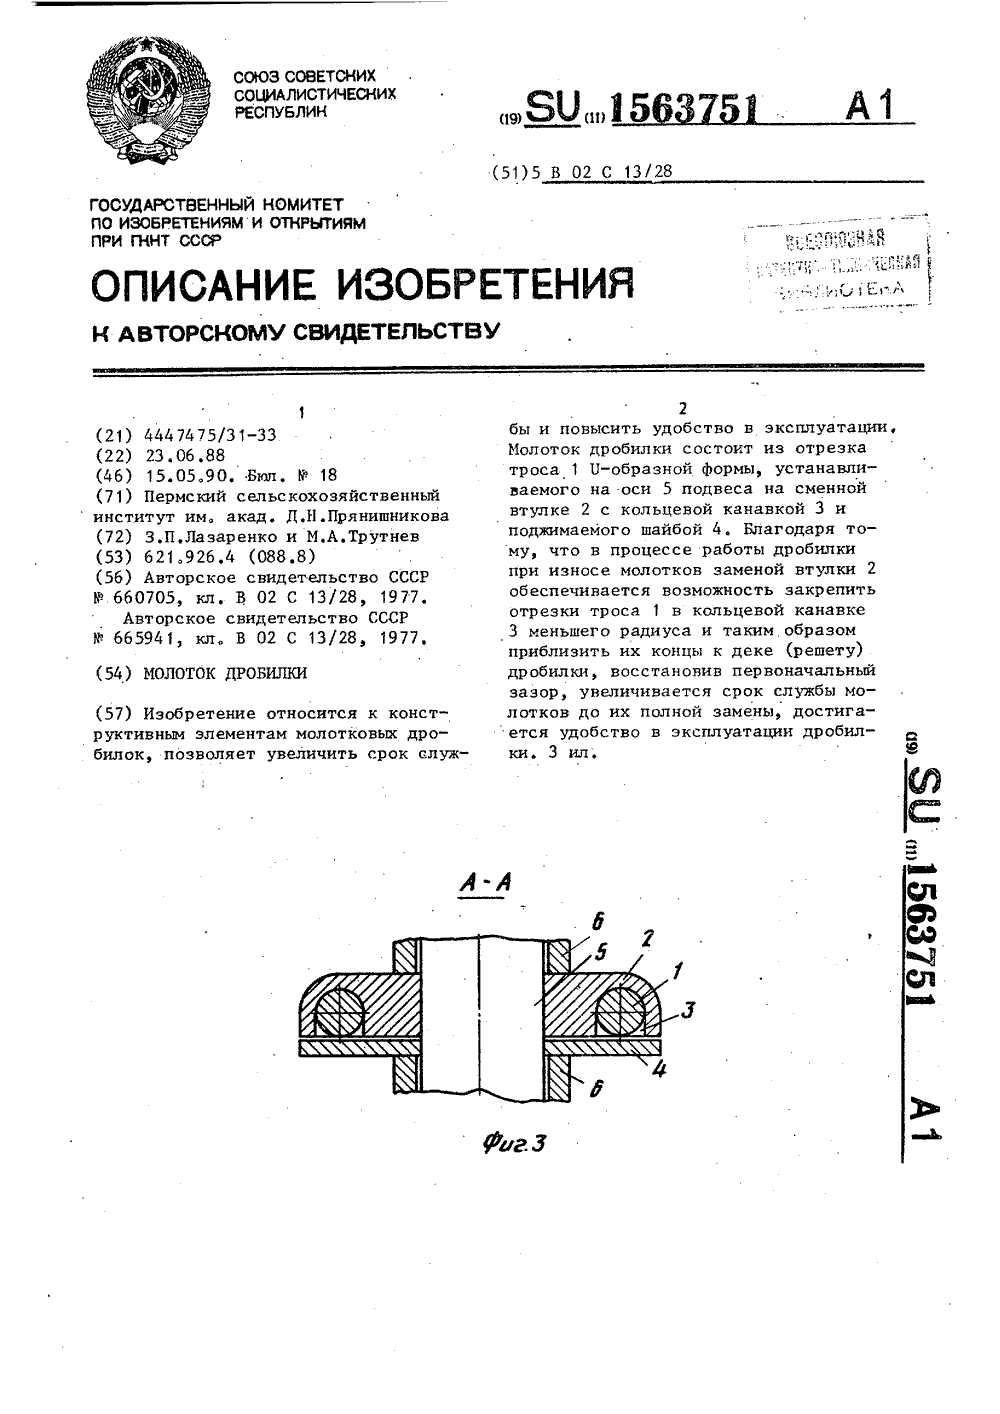 Дробилка молоток 1980 конусная дробилка ремонт в Щёлково